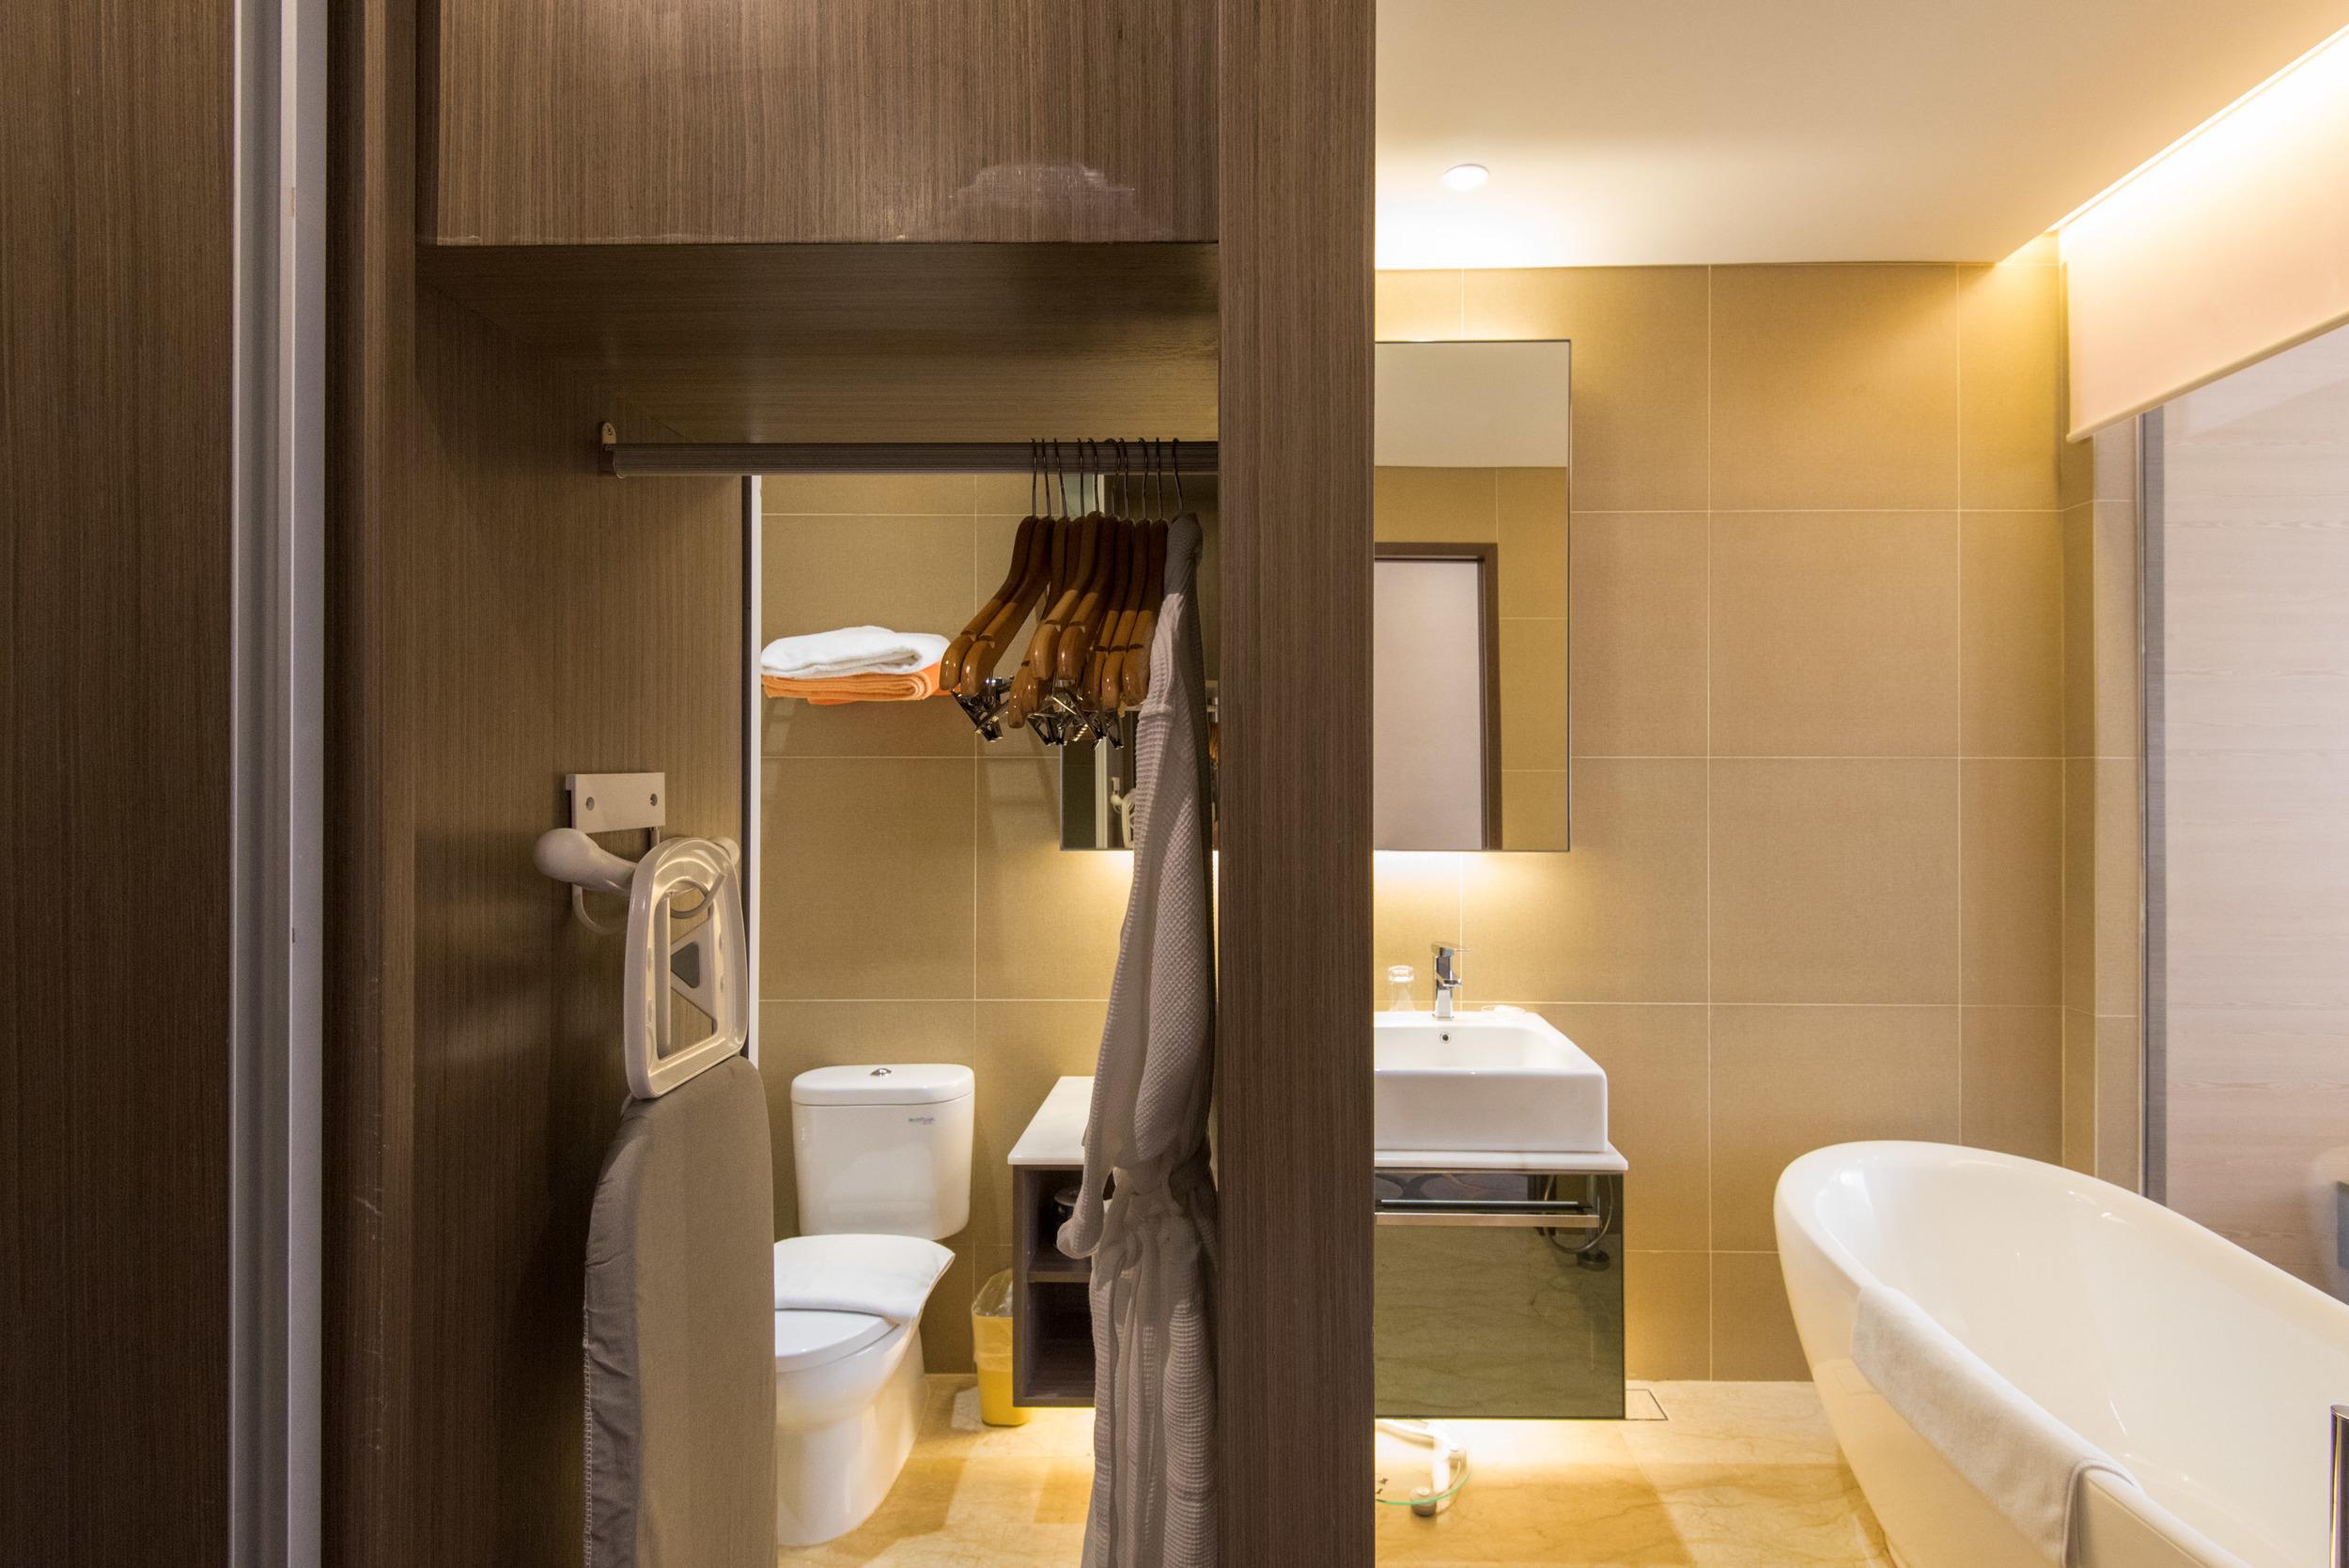 Wardrobe that opens into the Bathroom at Dorsett Singapore